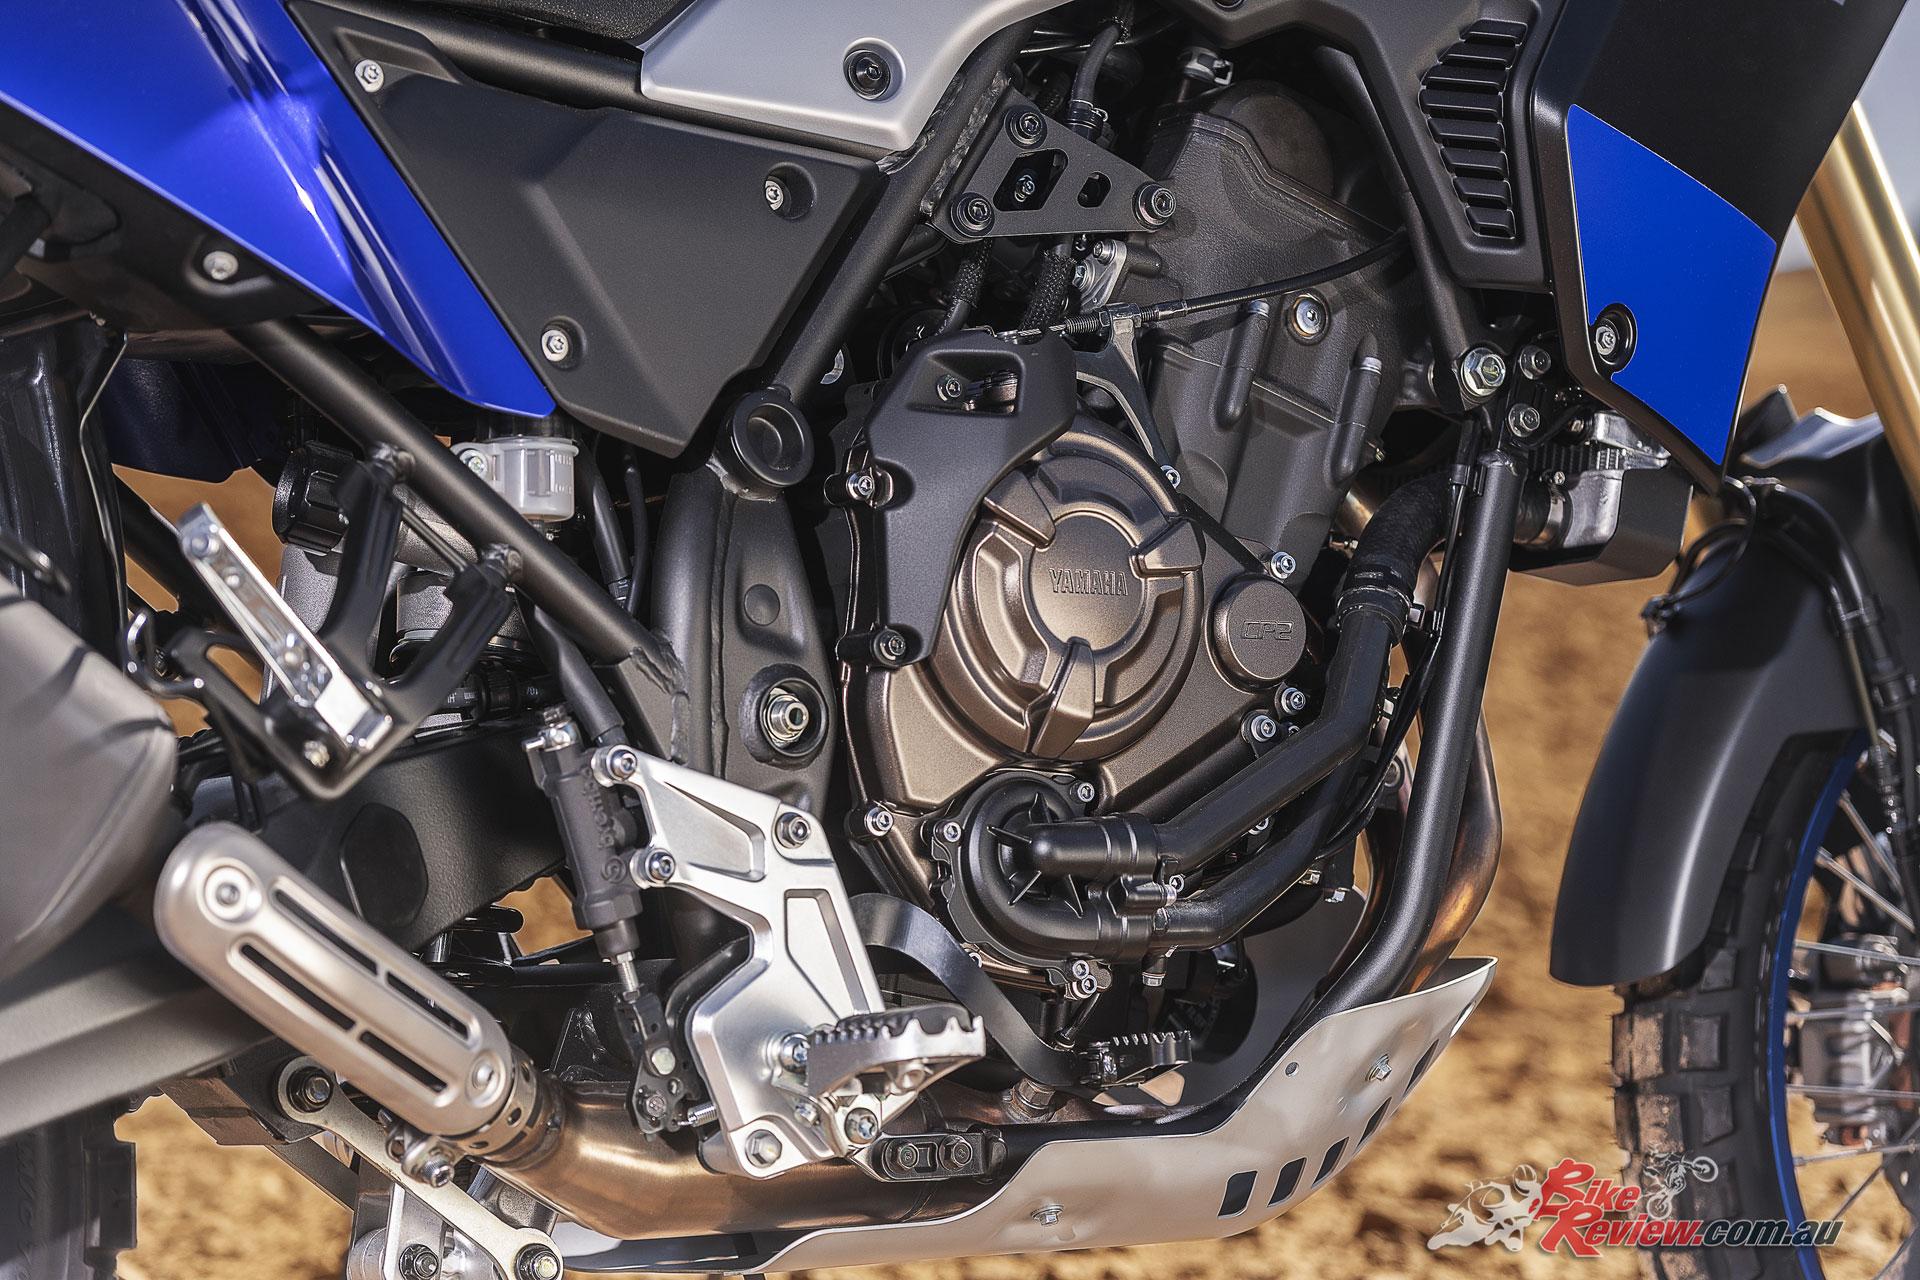 New Model: 2019 Yamaha Tenere 700 - Bike Review